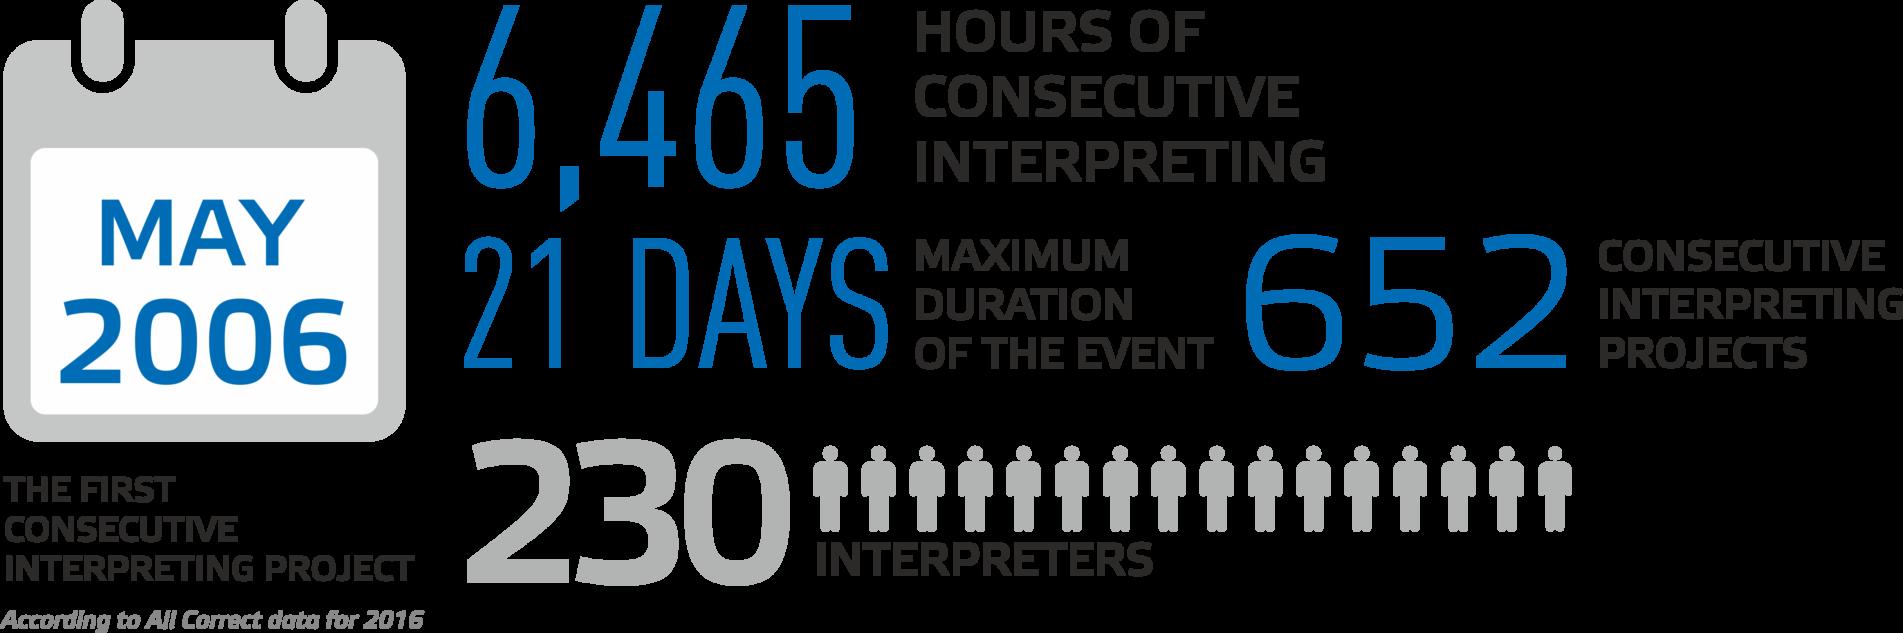 consecutive_interpreting_hor